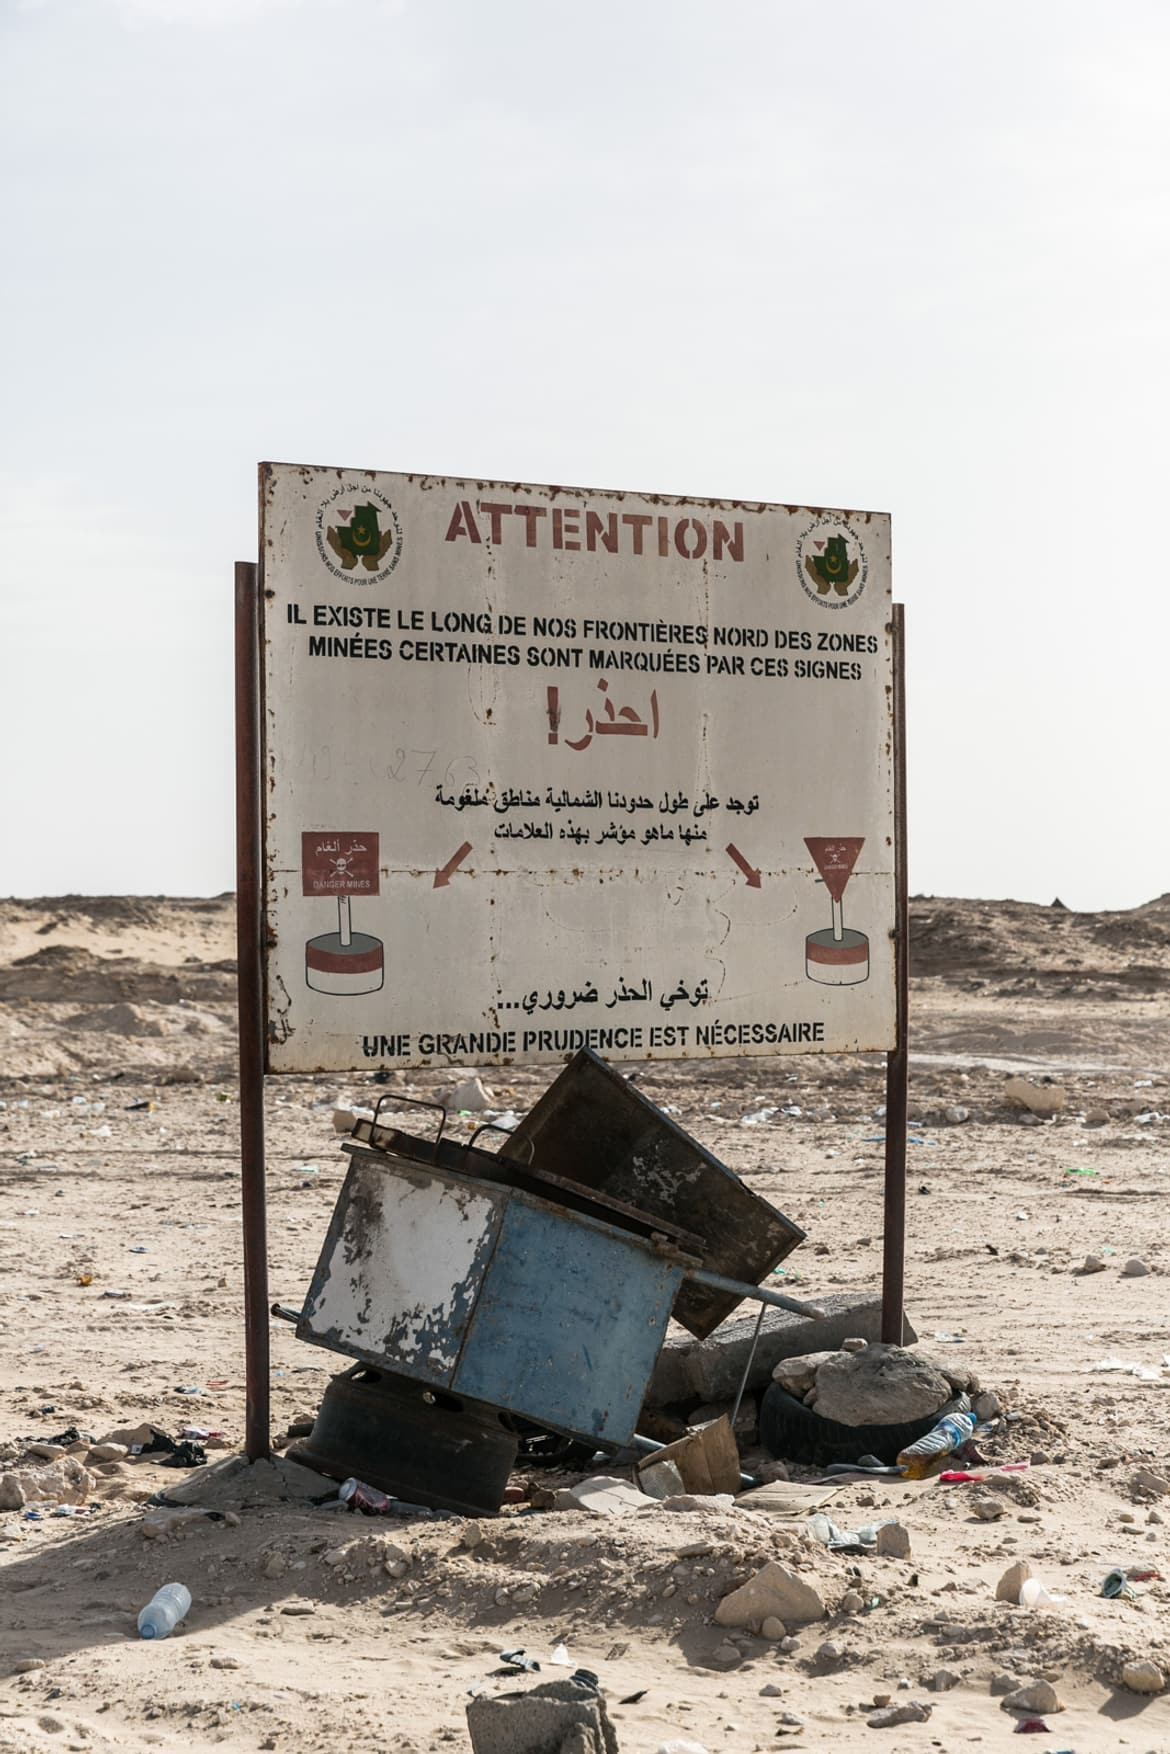 beyond-africa-surf-movie_beyond_mauritania_crossing_border_13_c_lupi_spuma.jpg